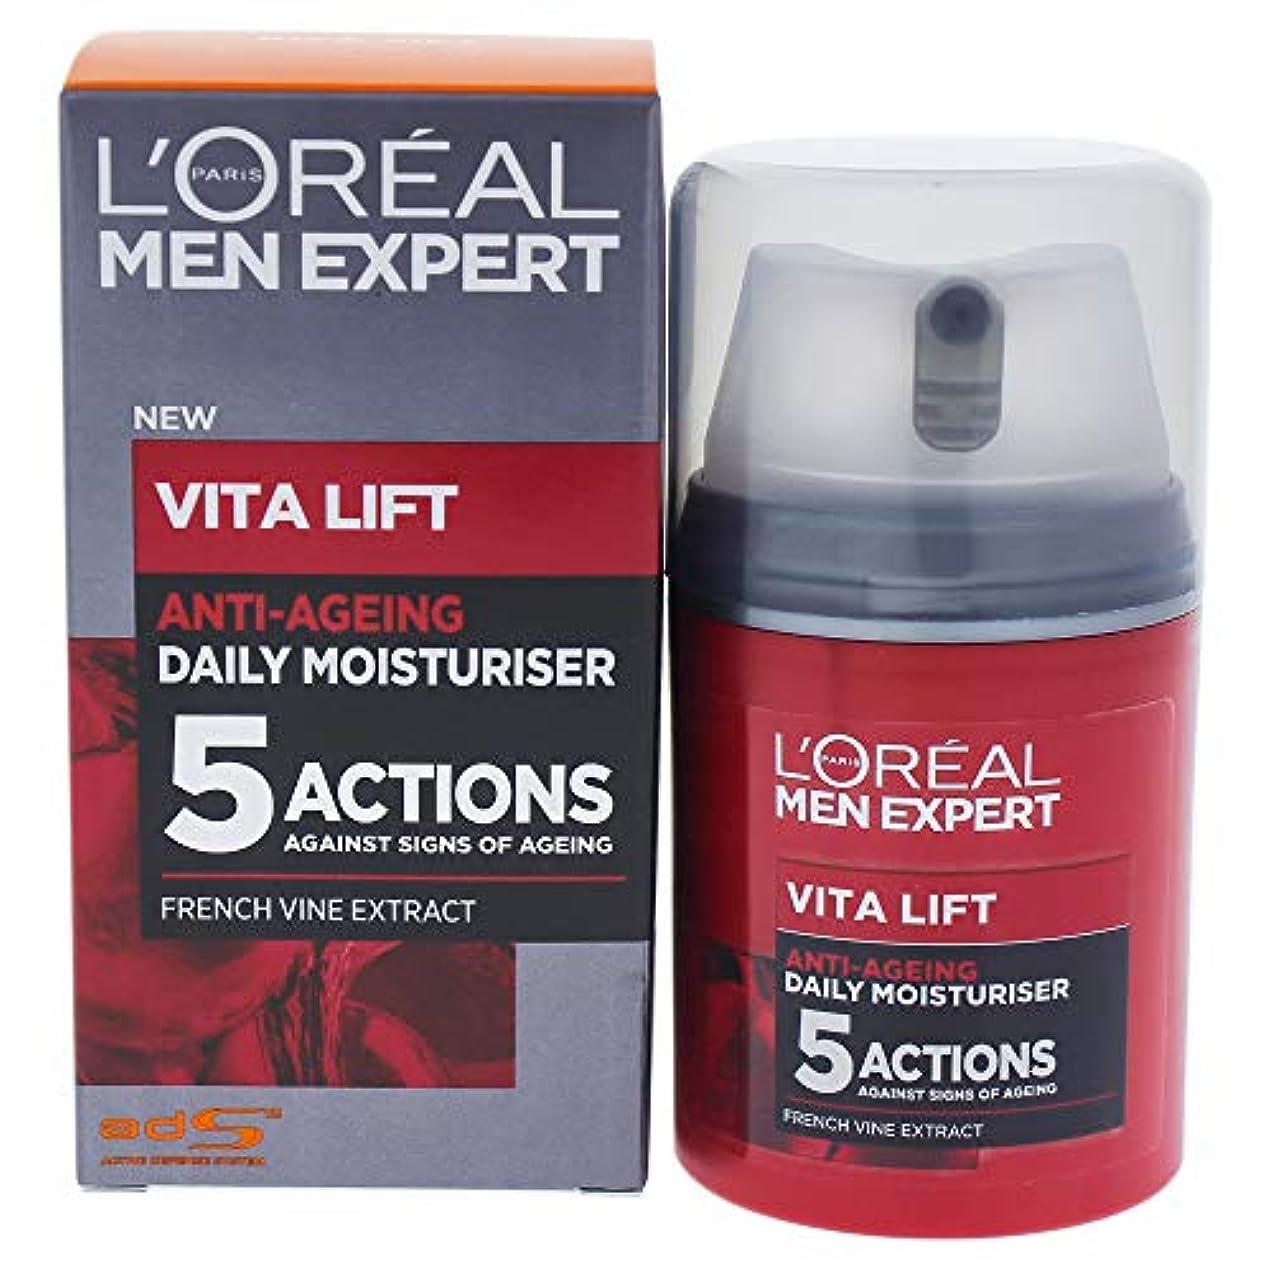 漂流状態血Men Expert Vita Lift 5 Daily Moisturiser